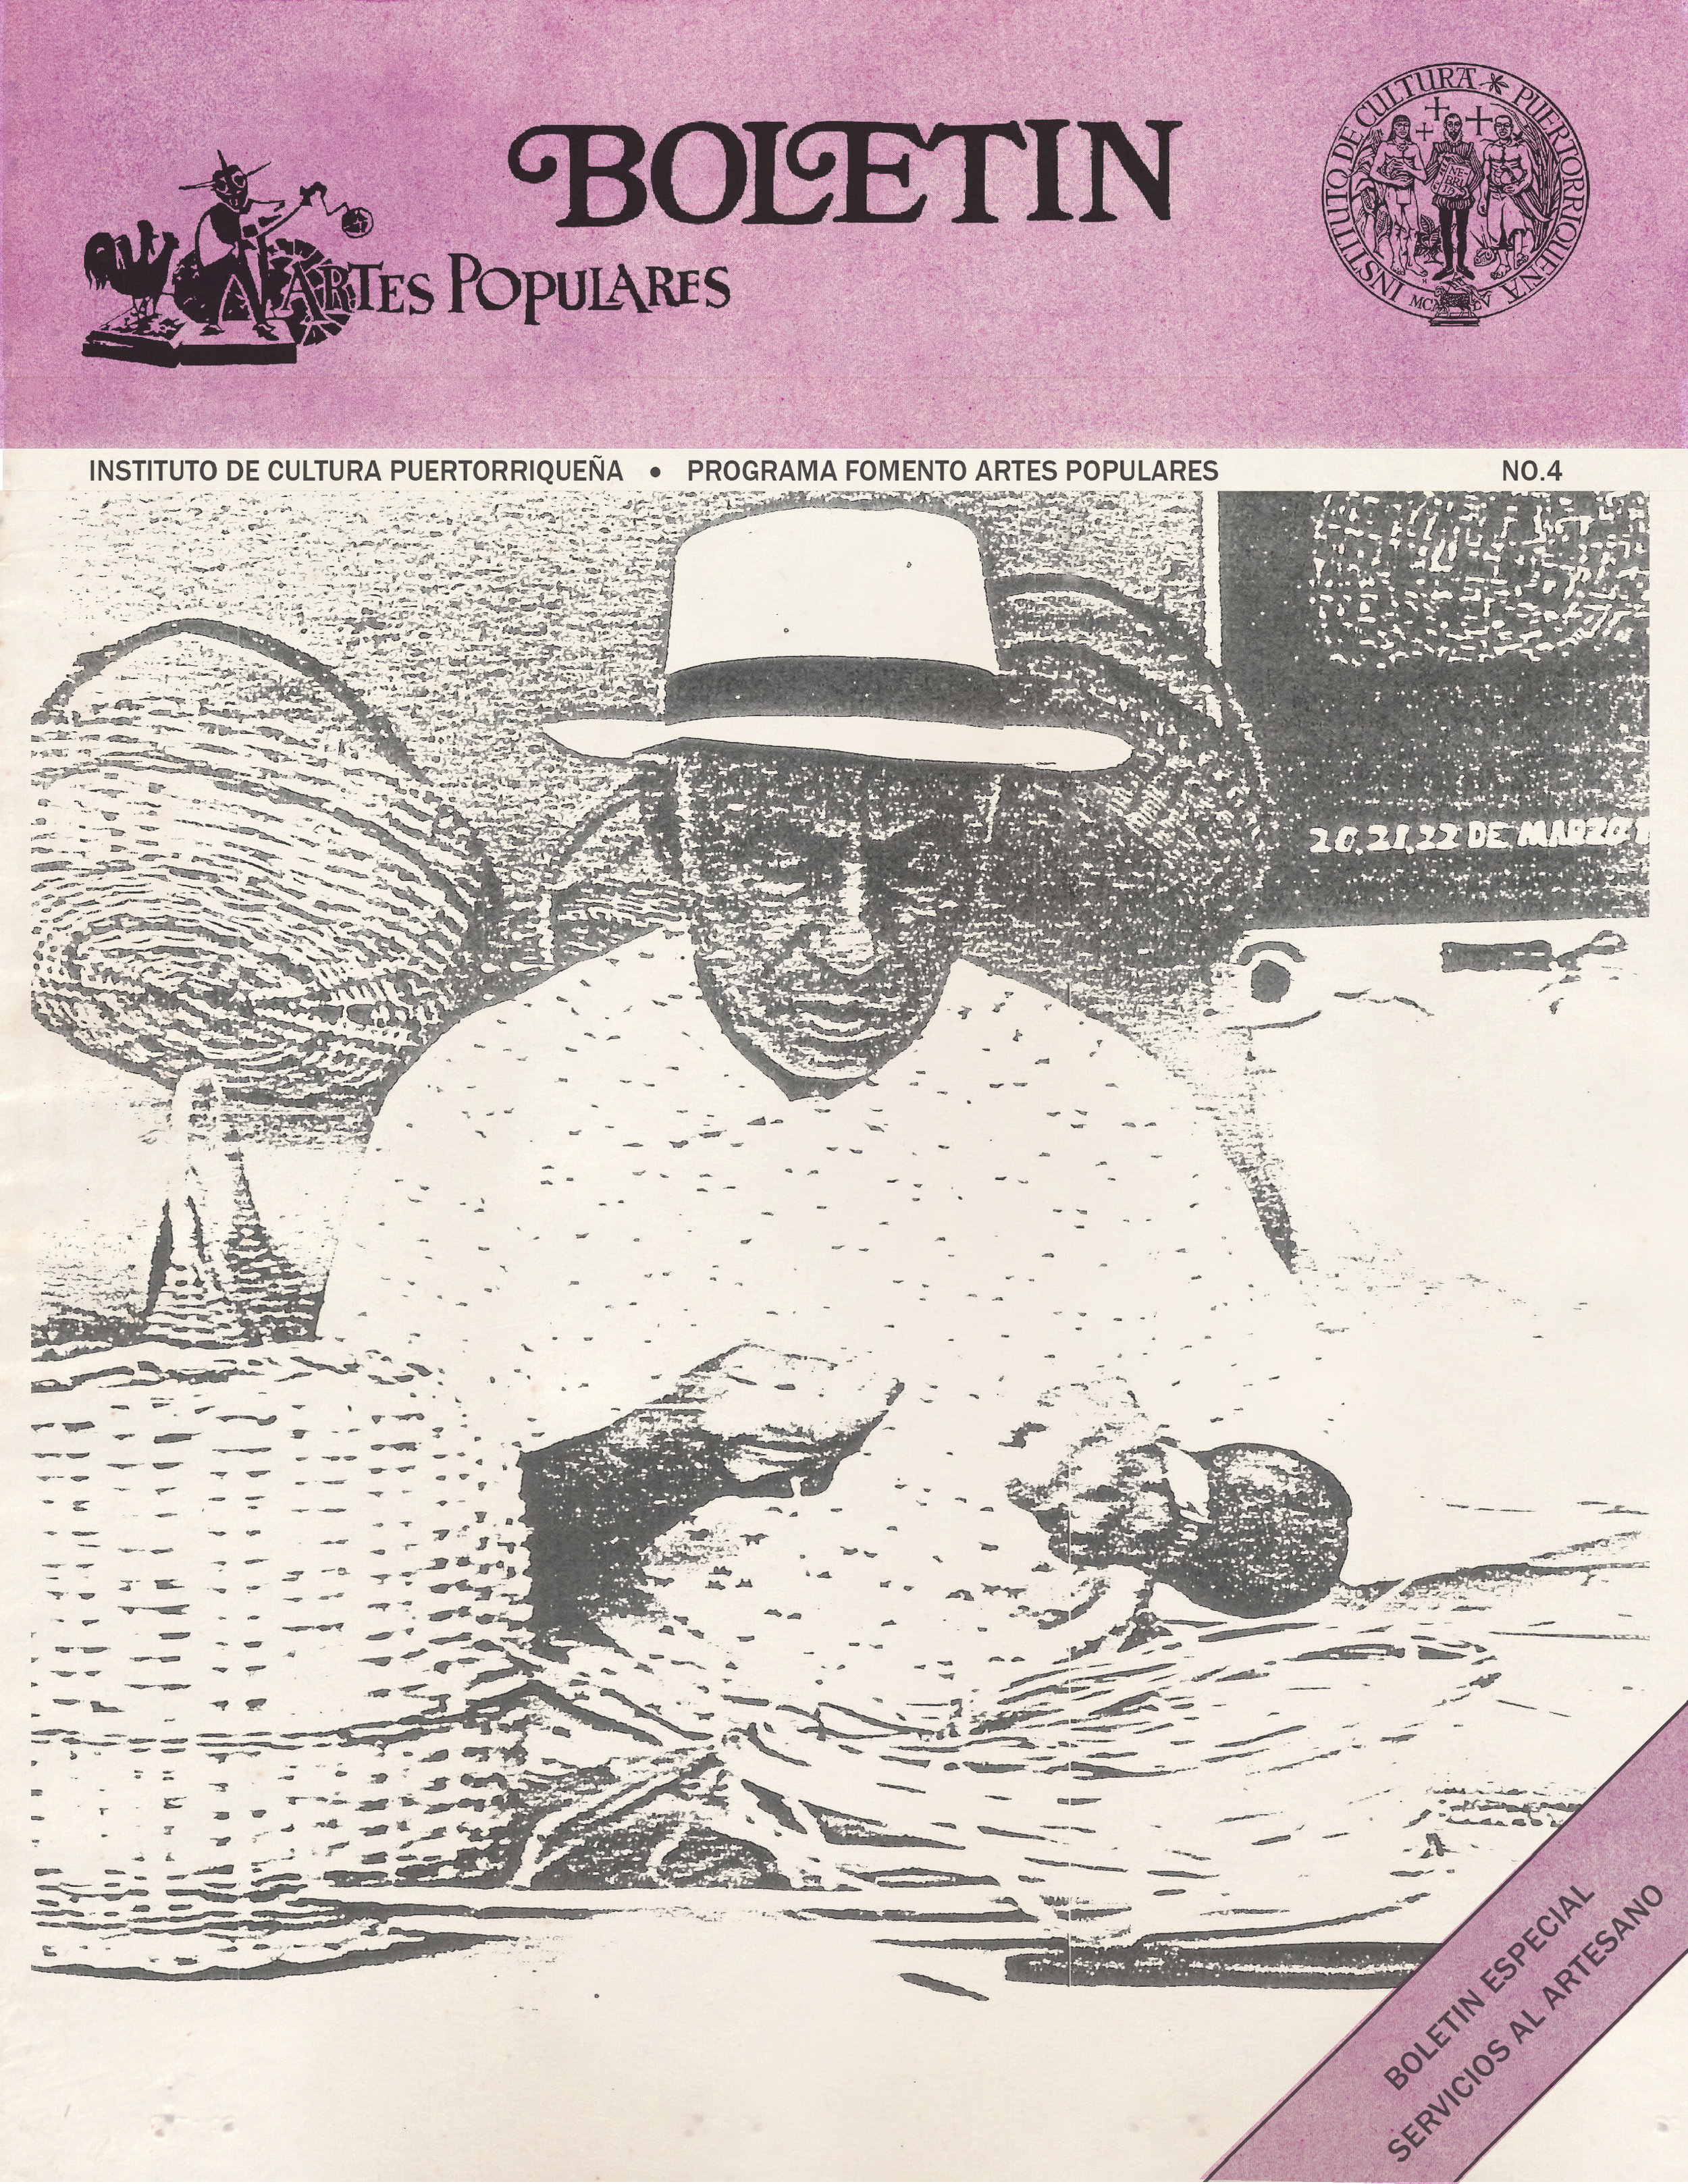 Boletín de Artes Populares #4.jpg